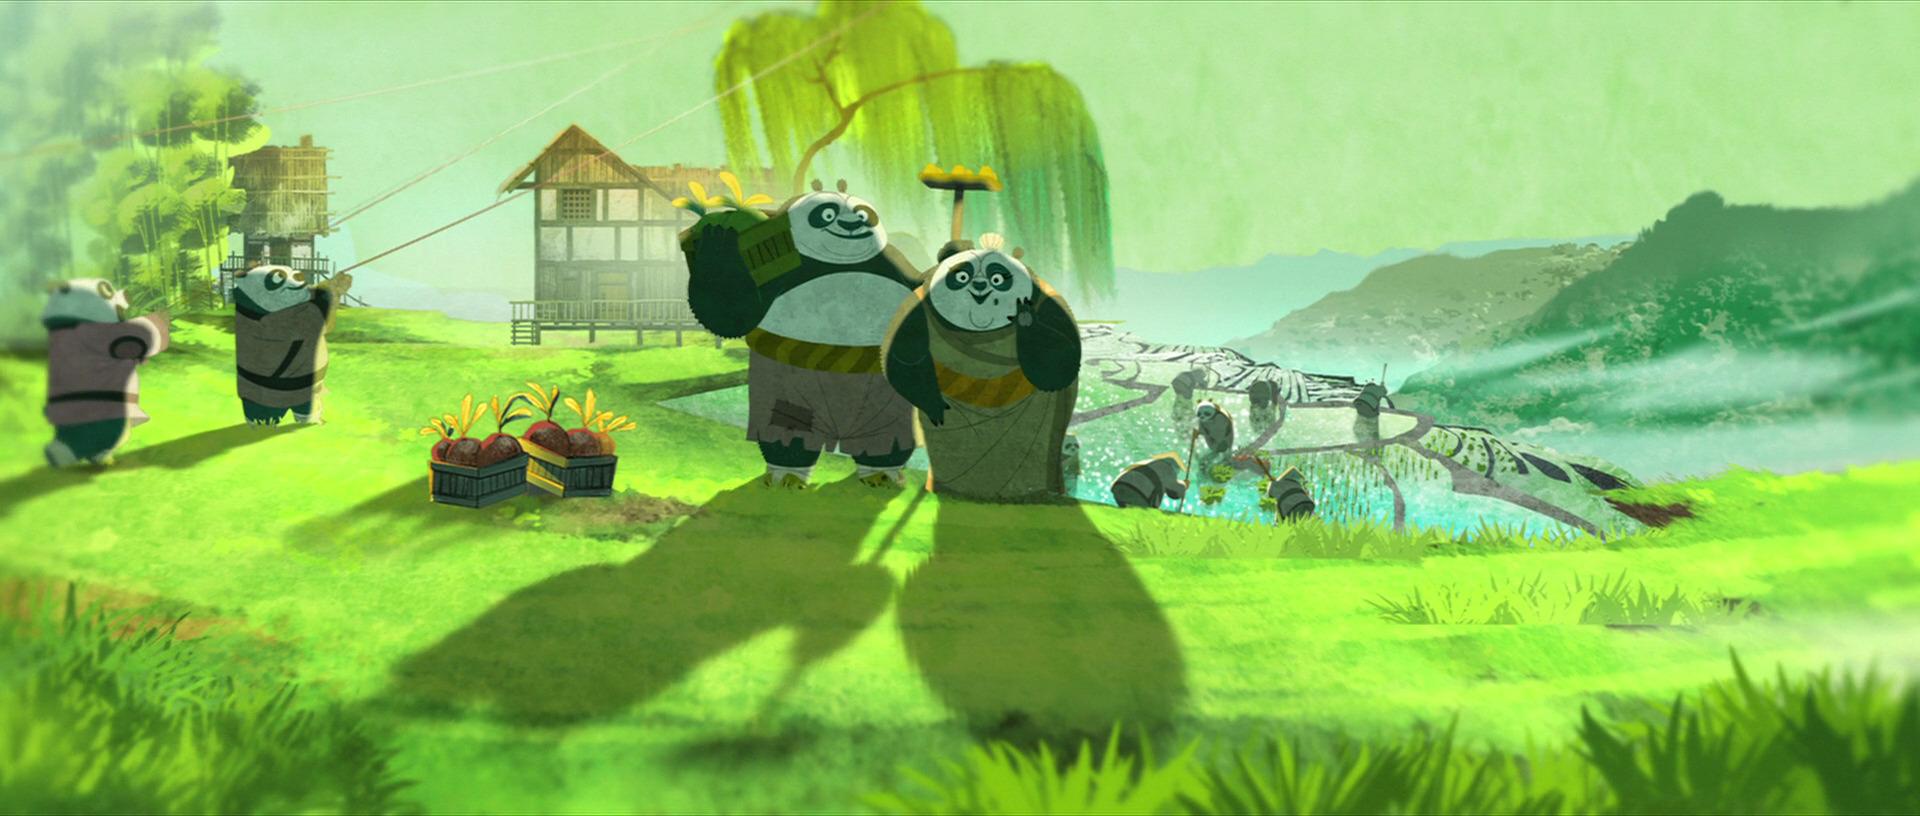 PandaVillageFlashback.jpg